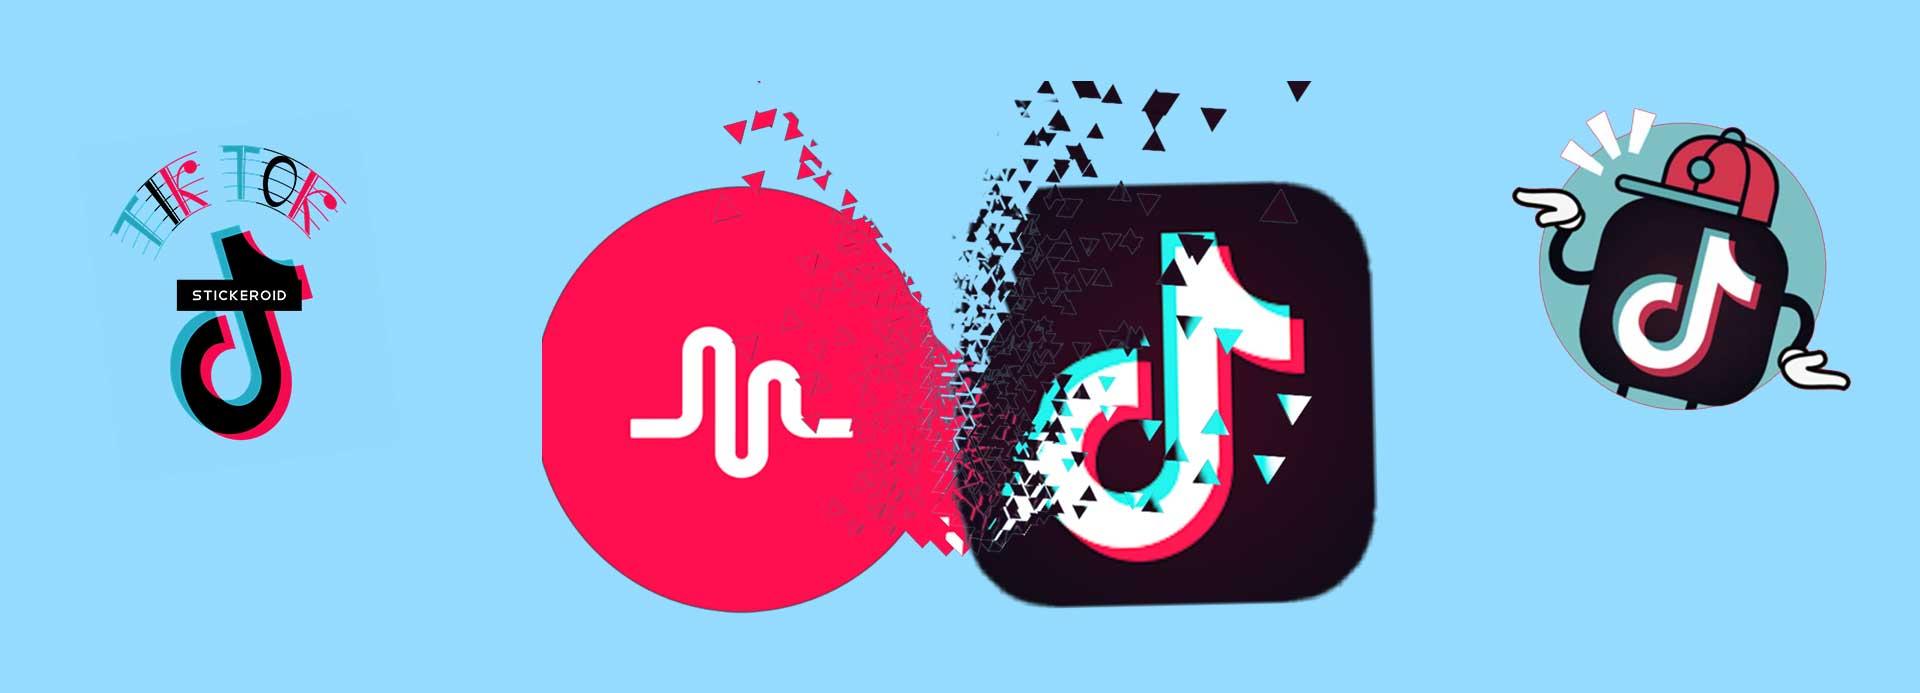 TikTok Video Marketing, The Next Big Thing